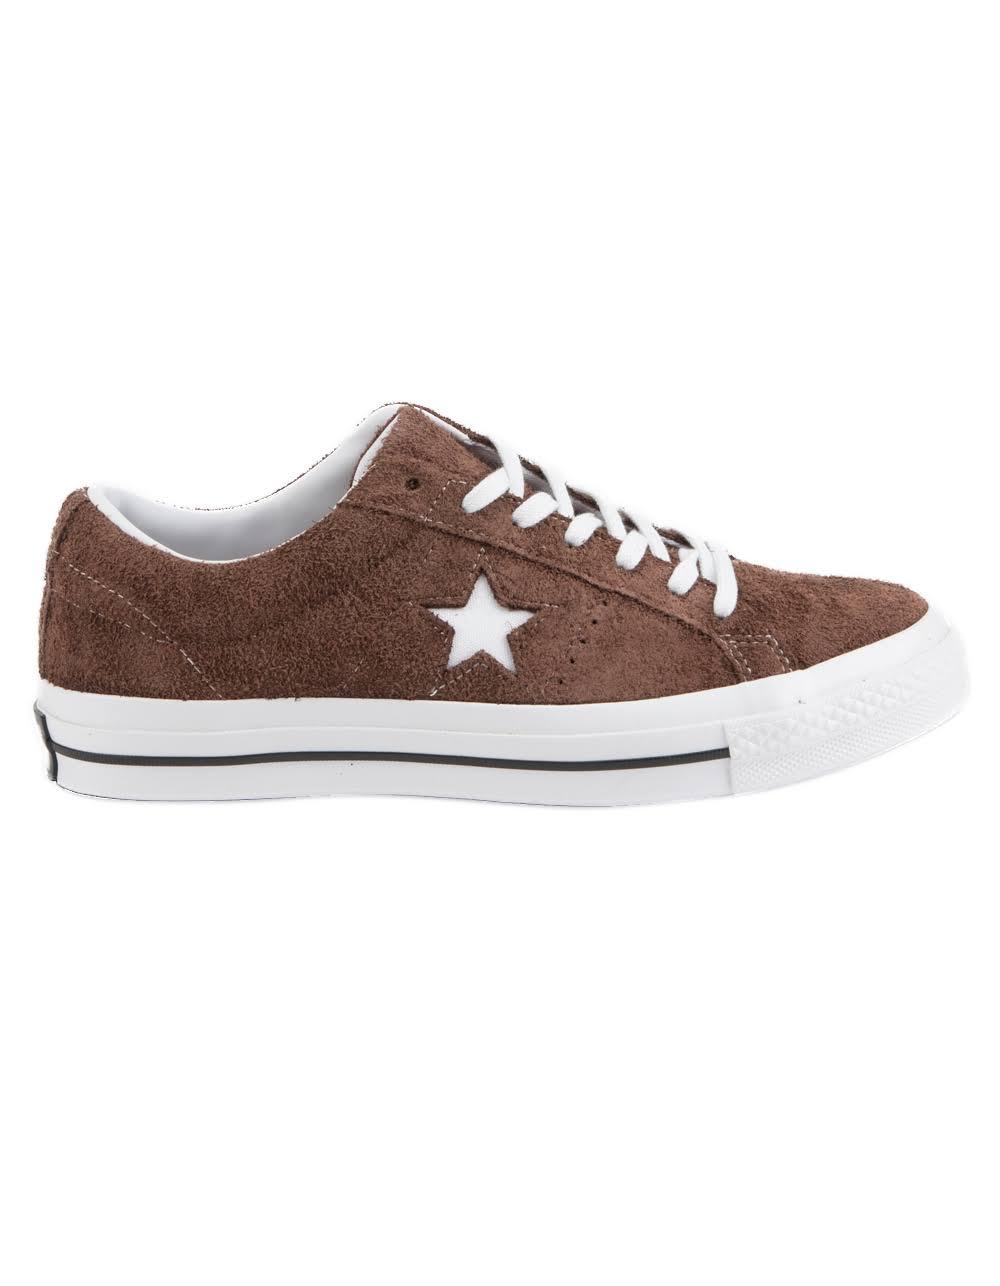 Herren Wt Ox Chocolate Chocolat Blanco Eu Converse One Star 5 44 q1wUU8